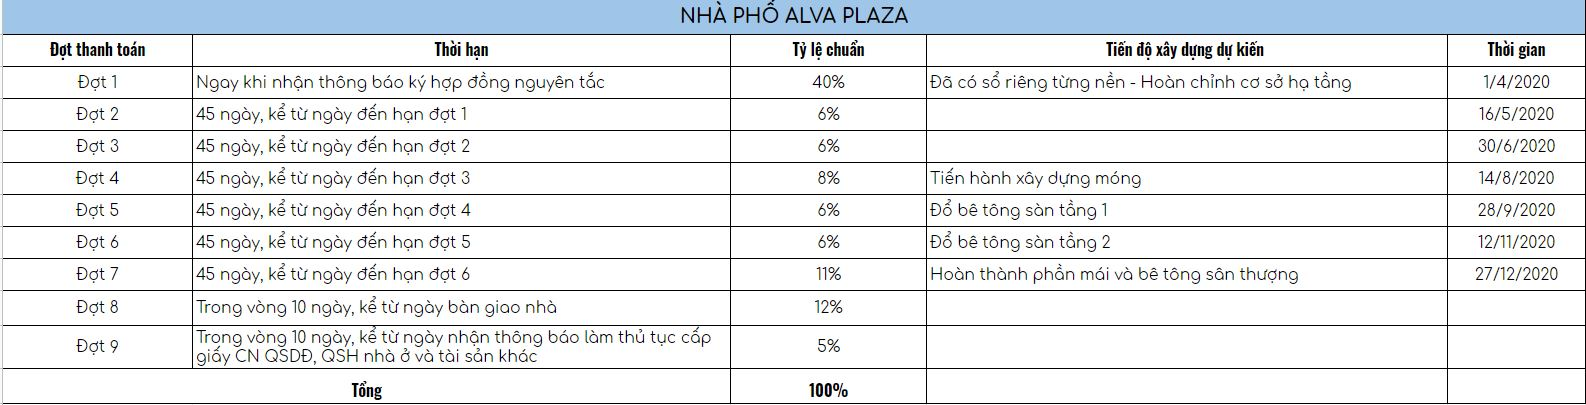 phuong thuc thuc thanh toan nha pho alva plaza